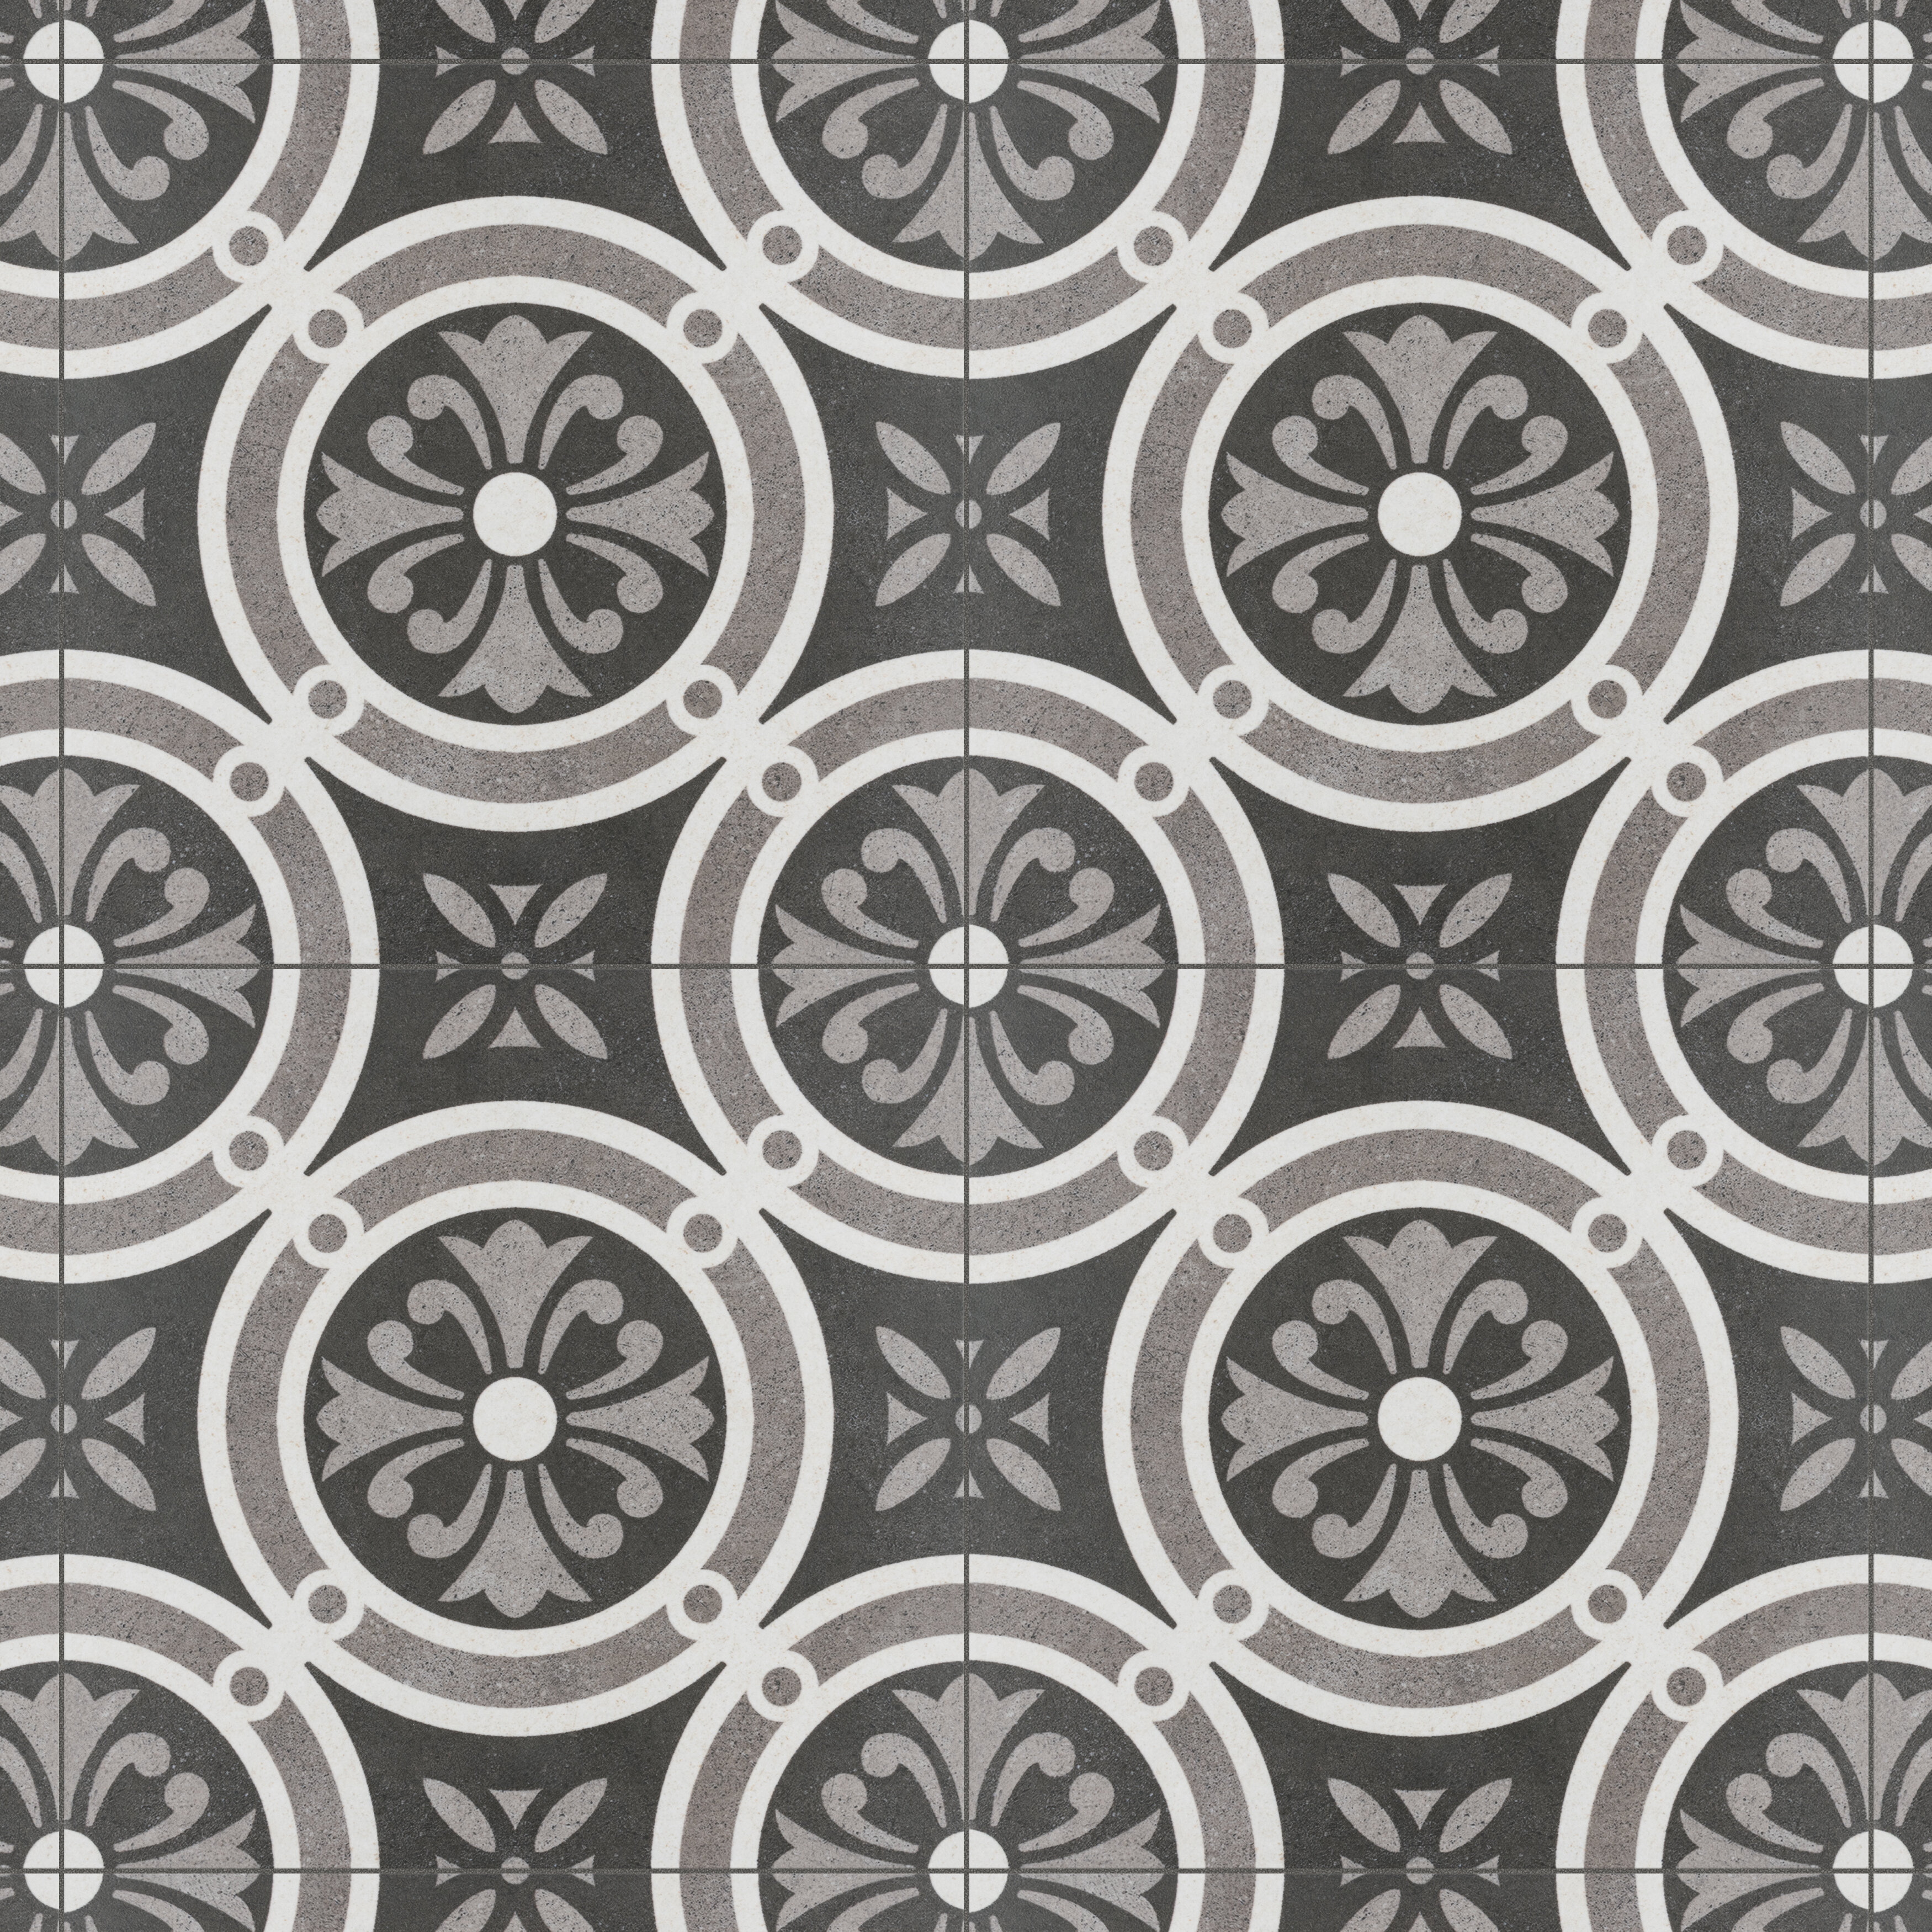 Elitetile Annata 10 X 10 Porcelain Wall Floor Tile Reviews Wayfair